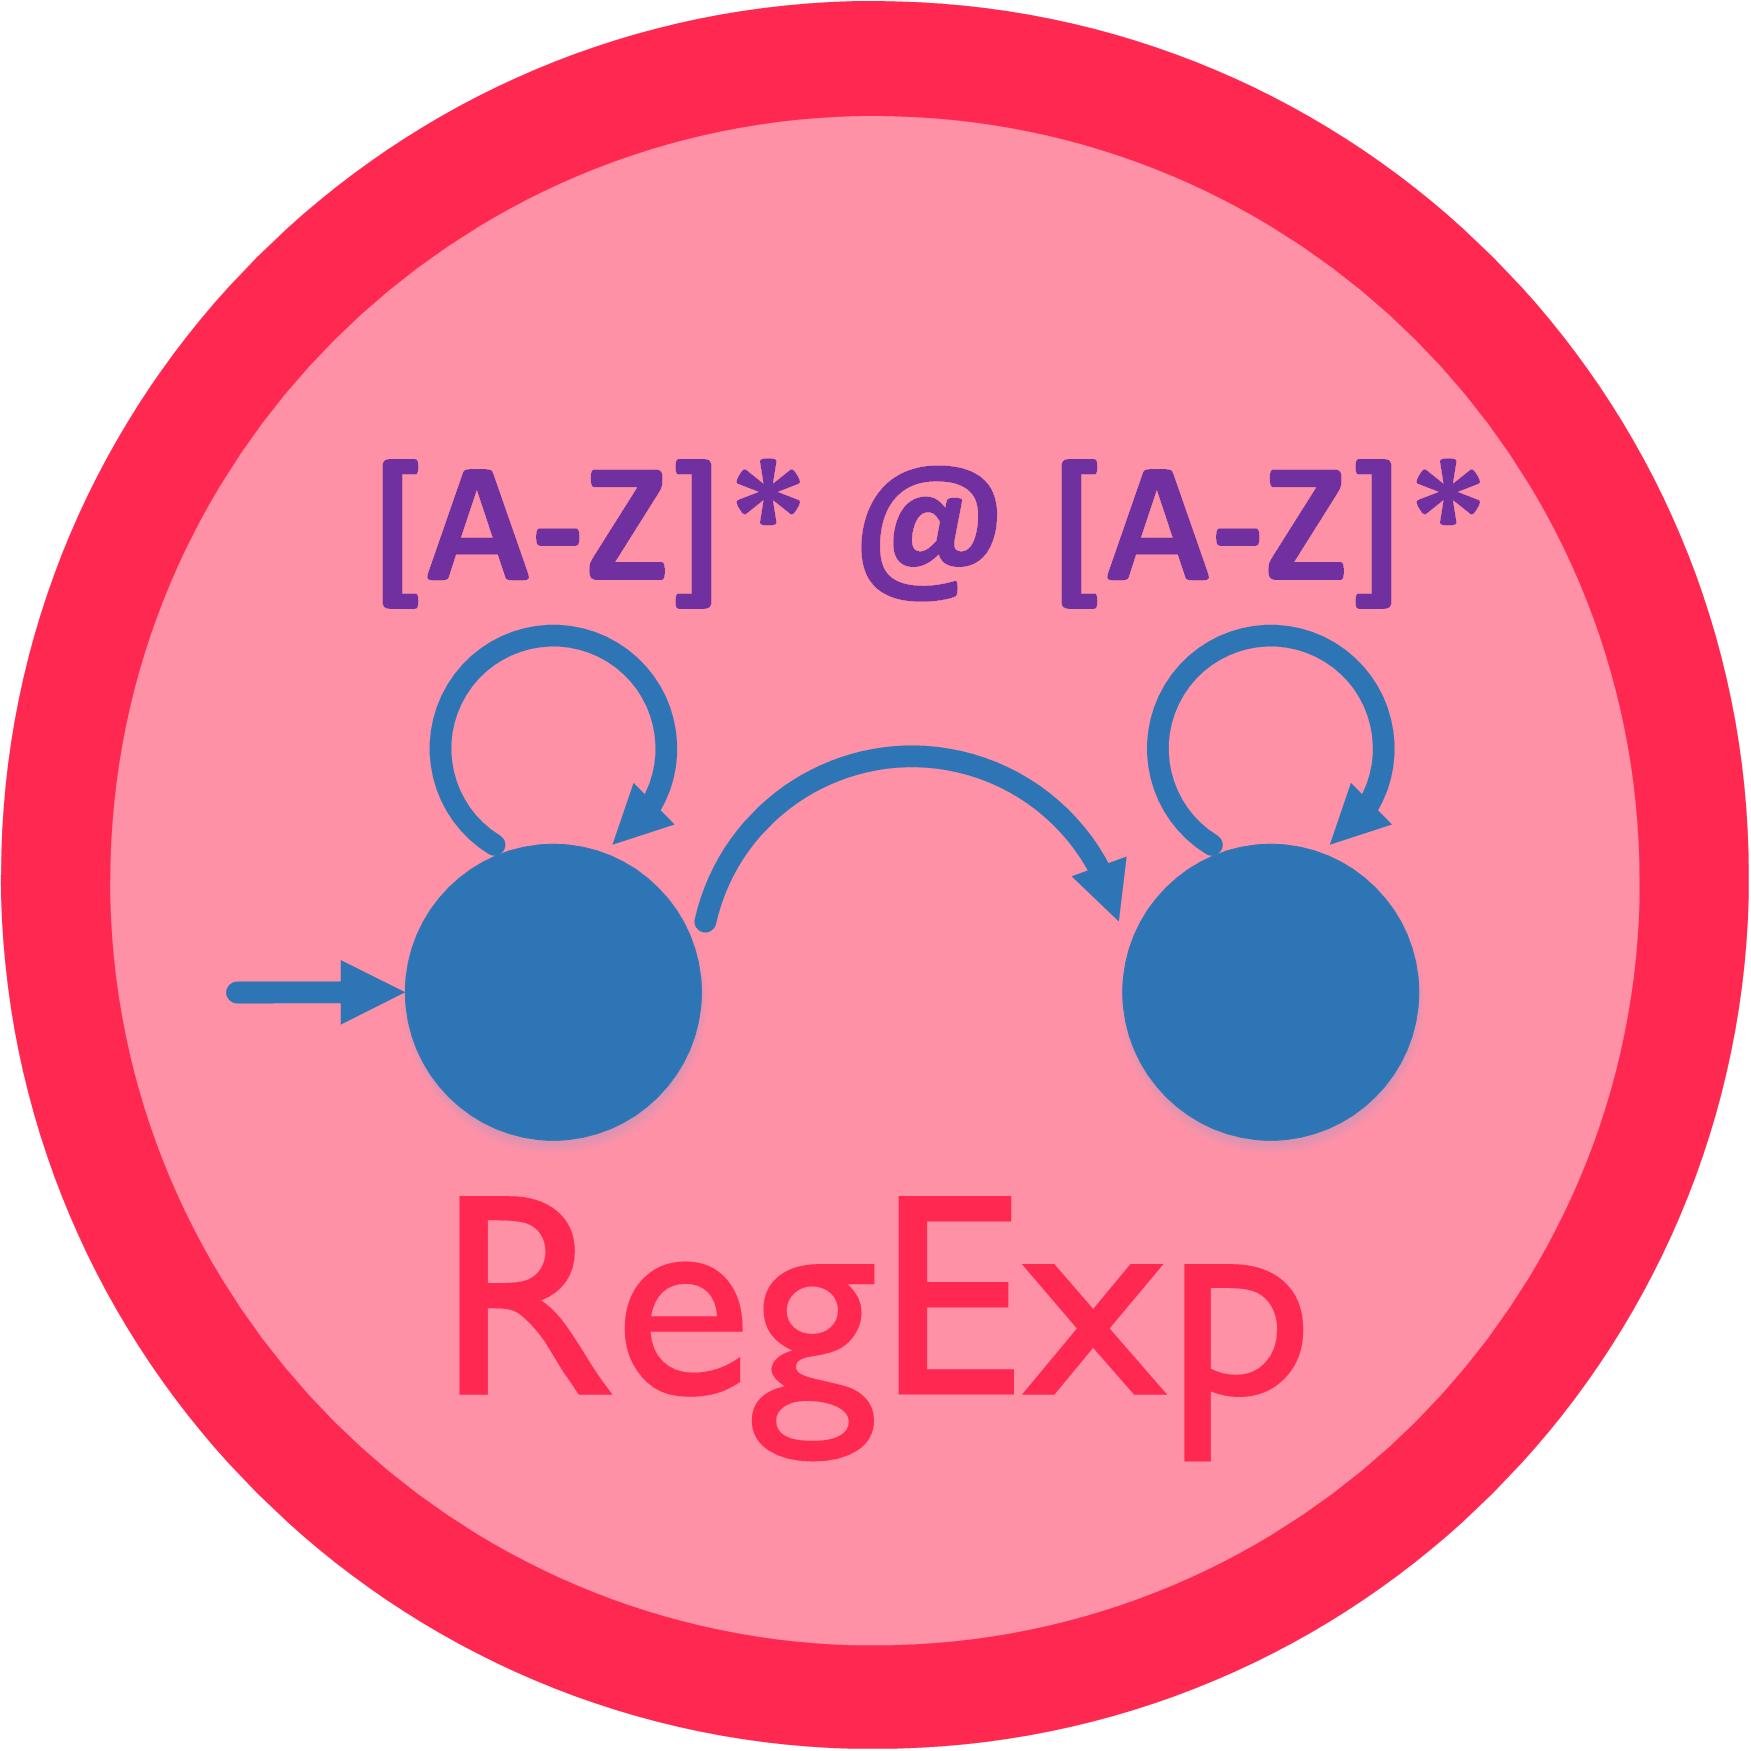 Expresiones regulares - Regexp - Pattern matching